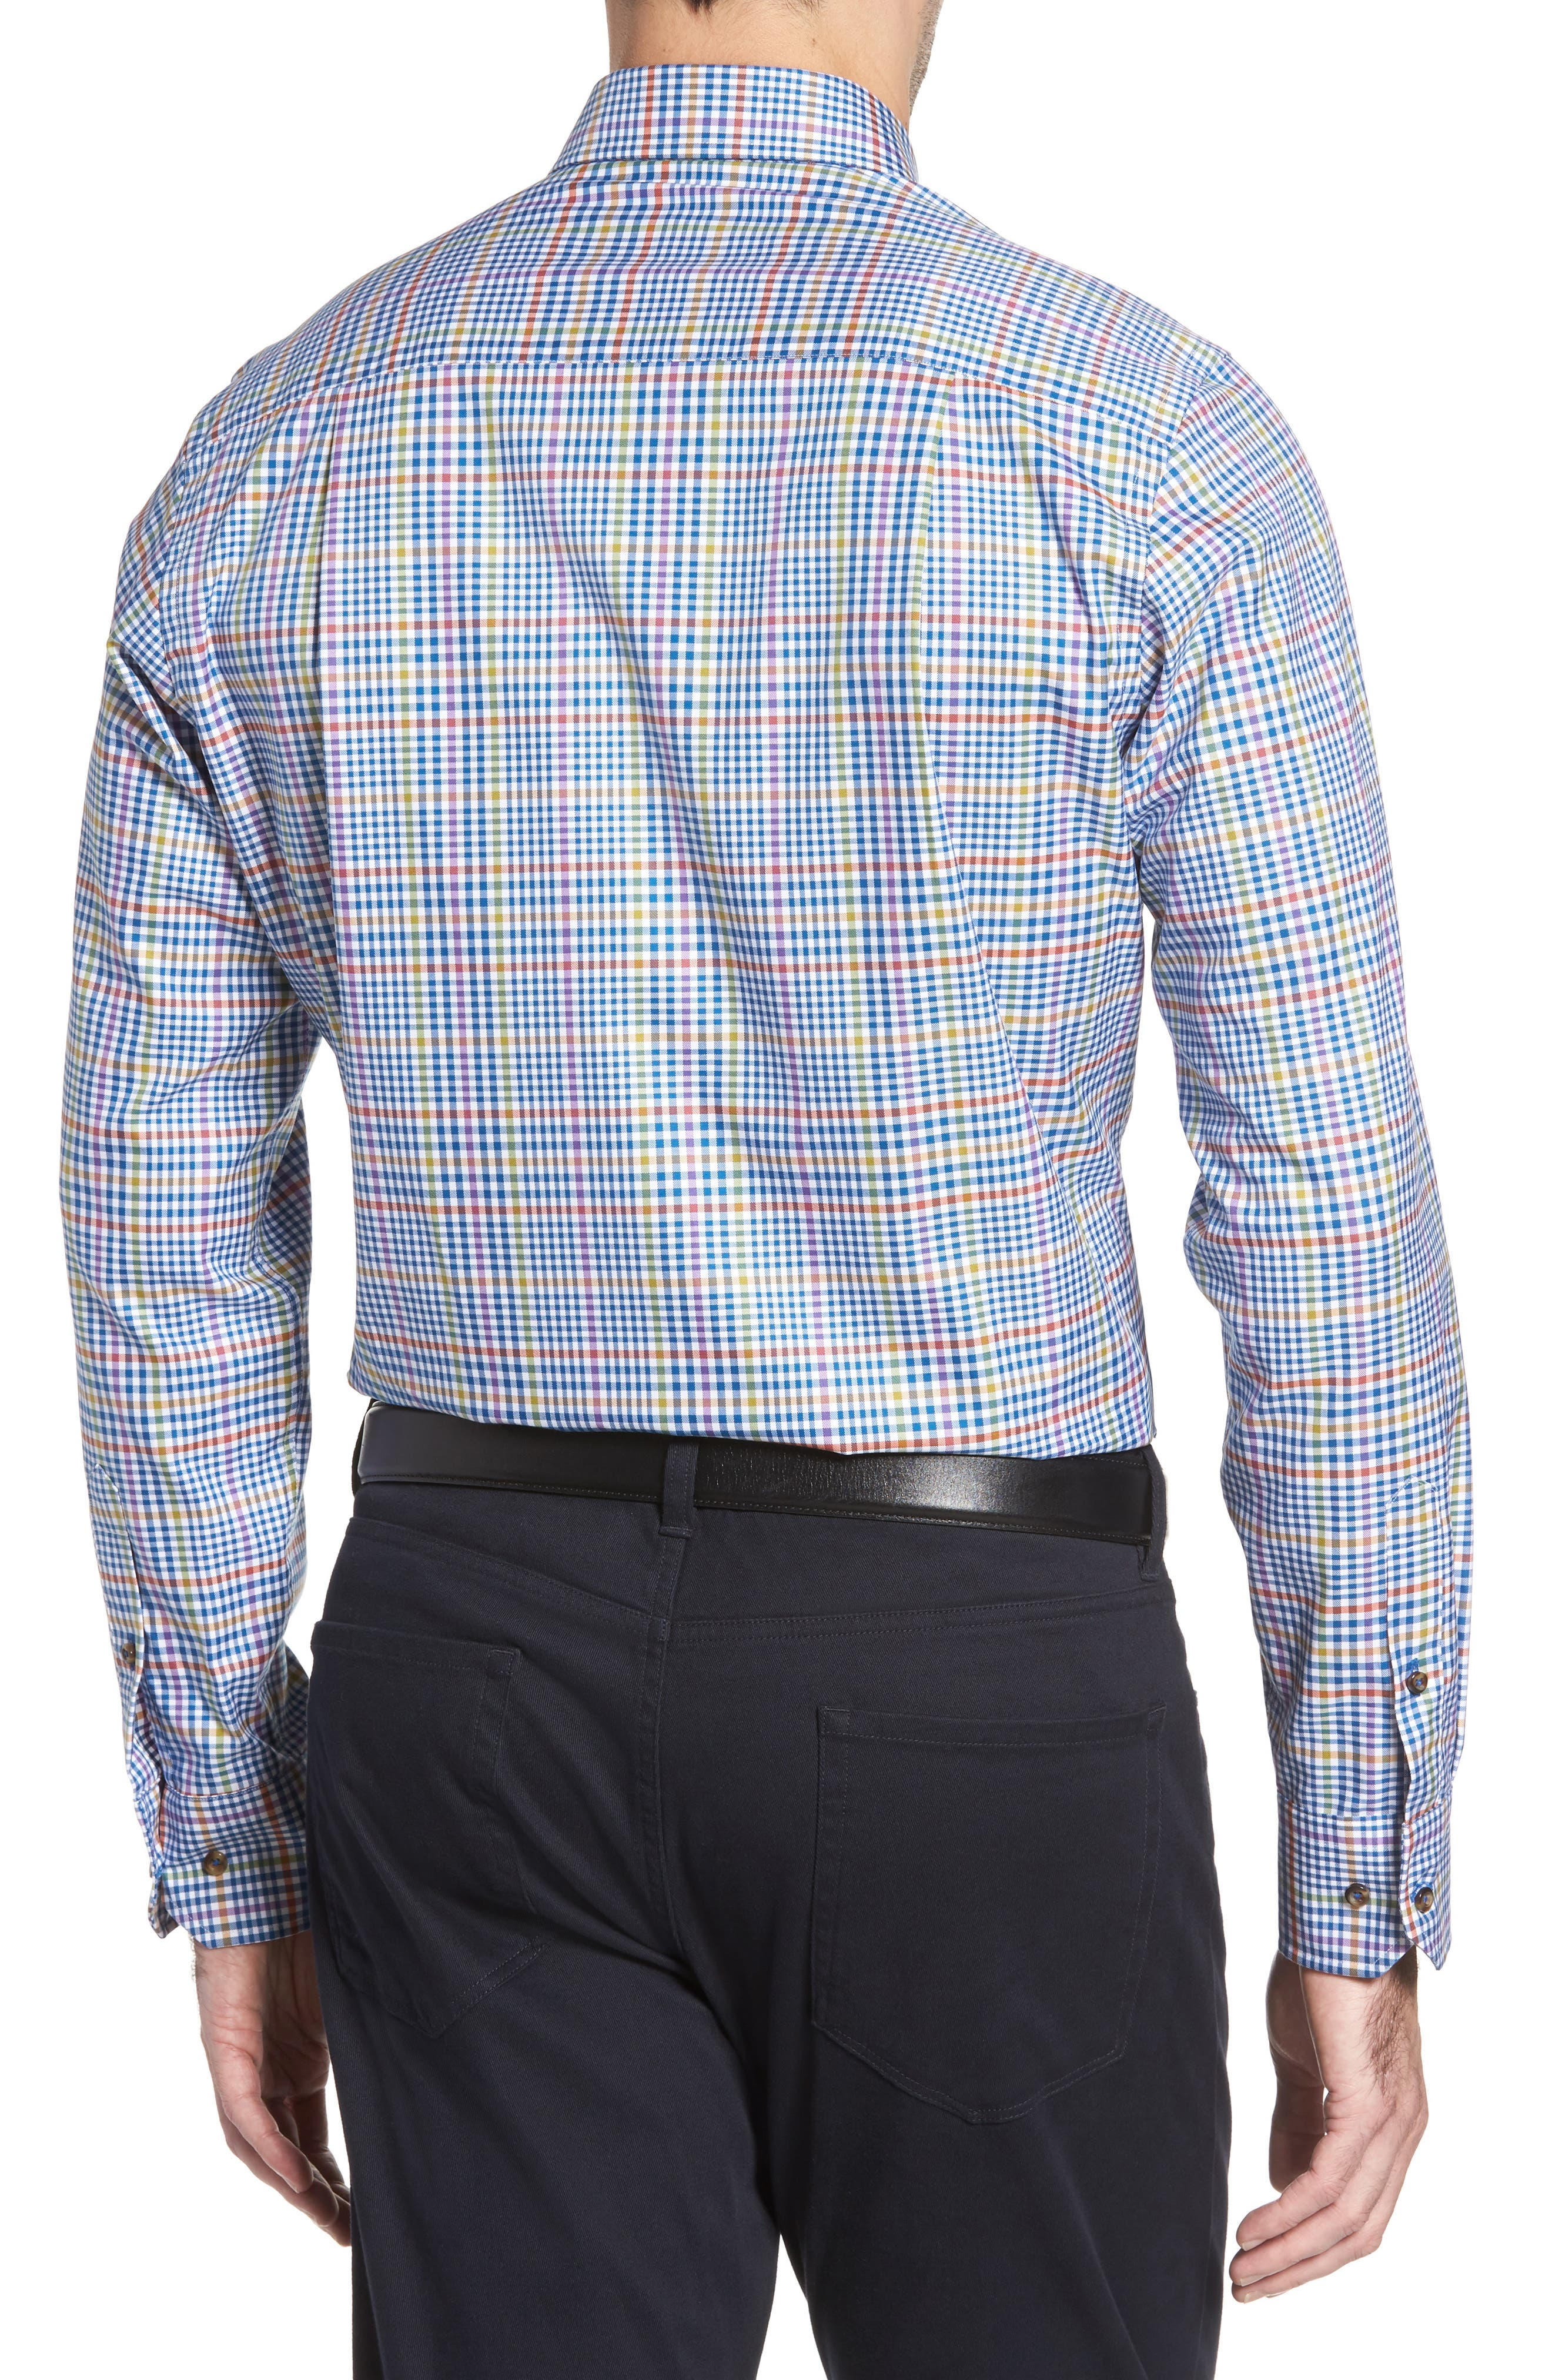 Regular Fit Plaid Sport Shirt,                             Alternate thumbnail 2, color,                             423